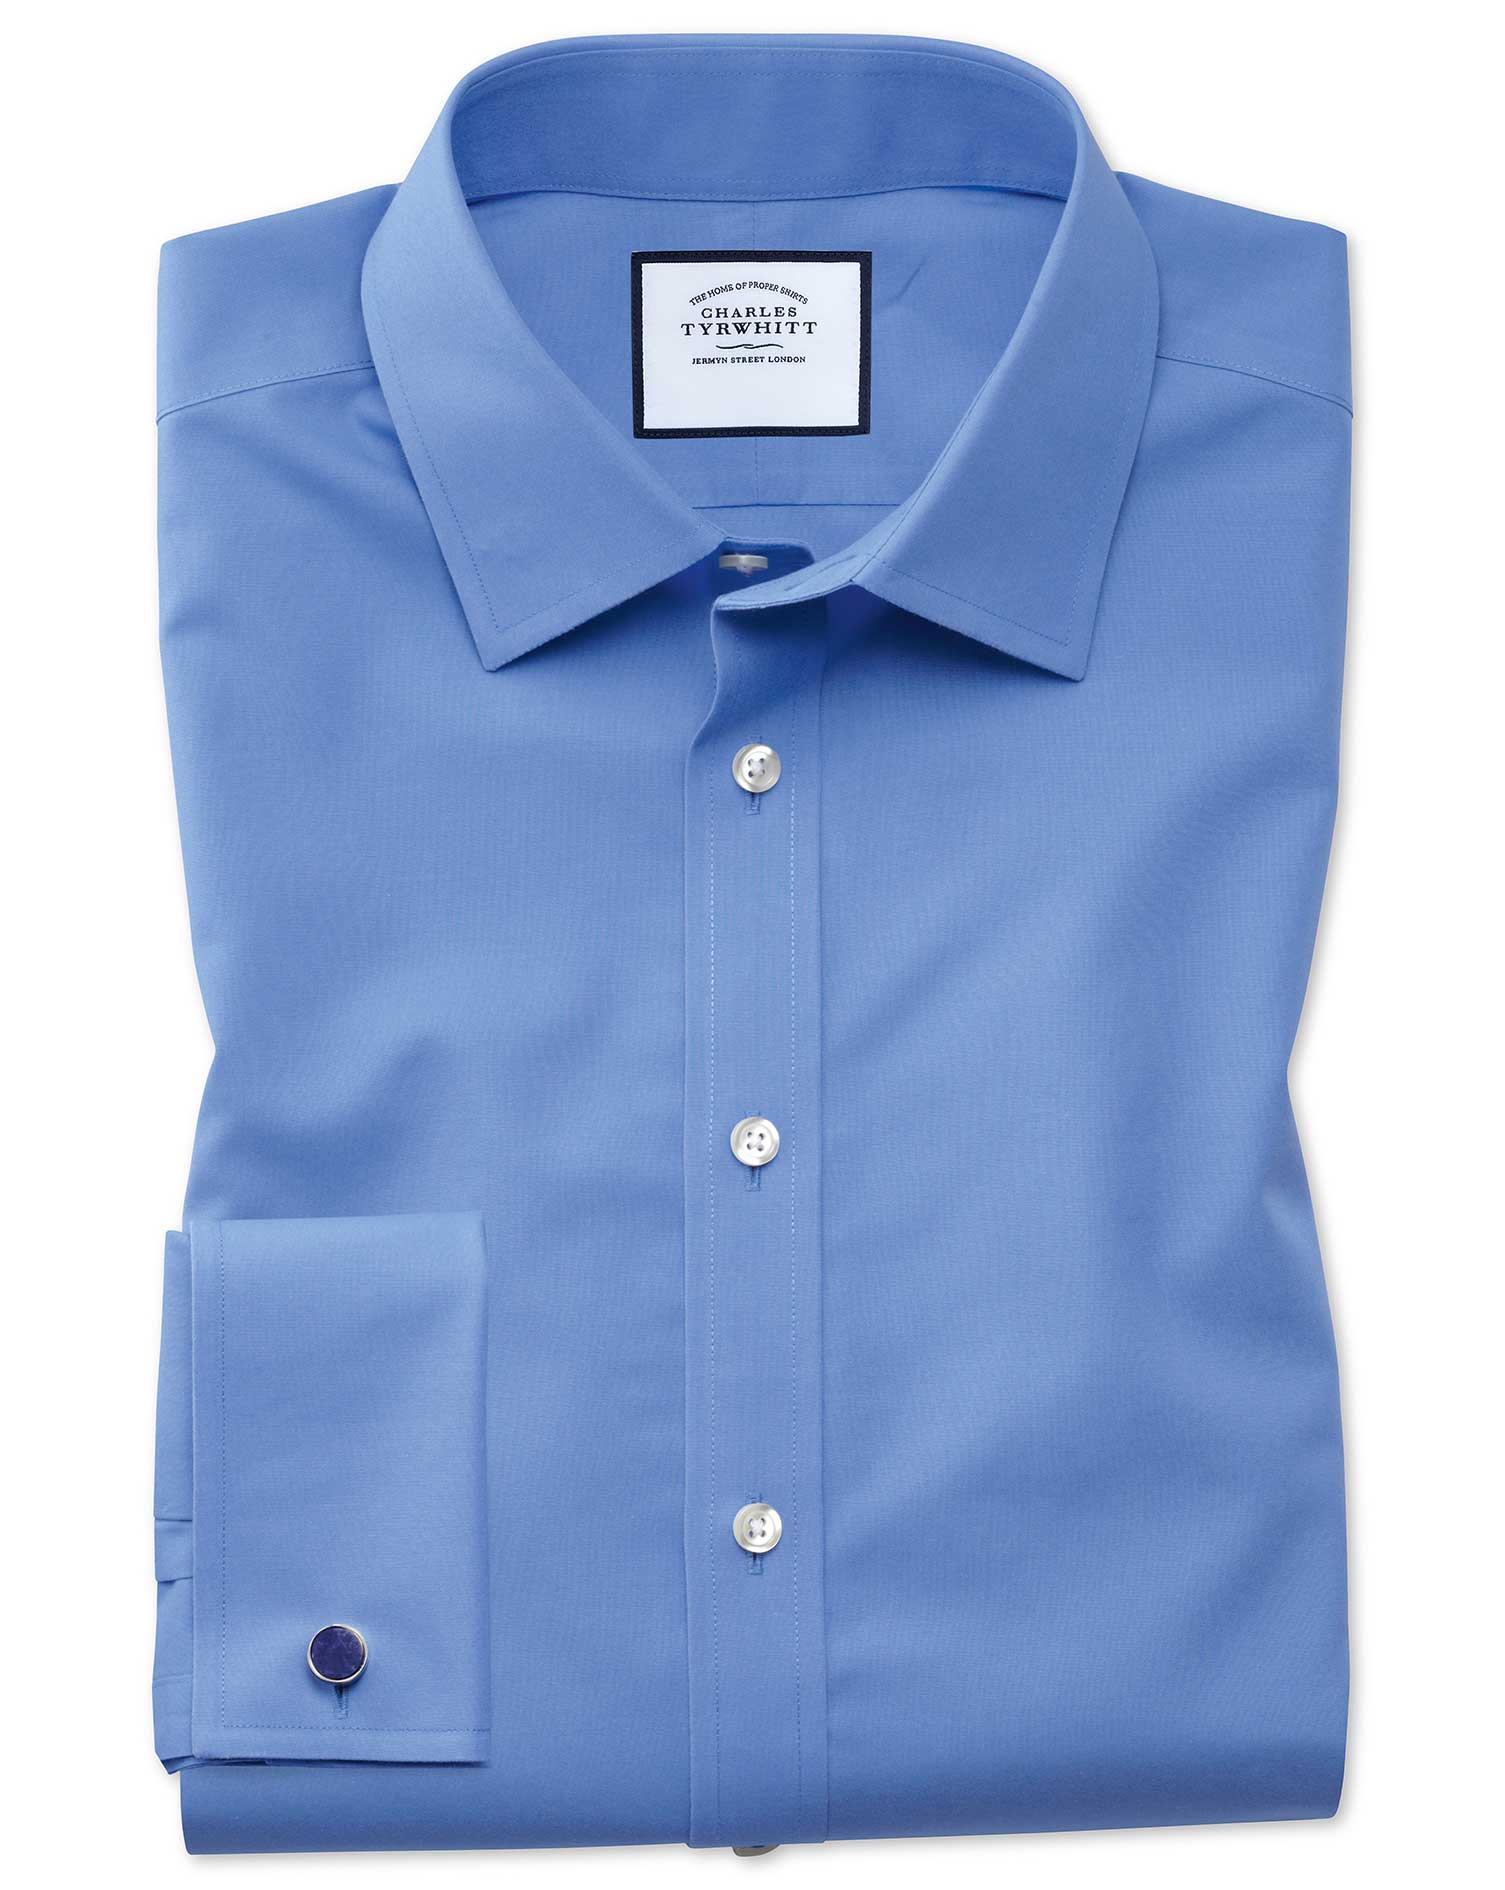 Slim Fit Non-Iron Poplin Blue Cotton Formal Shirt Single Cuff Size 18/37 by Charles Tyrwhitt